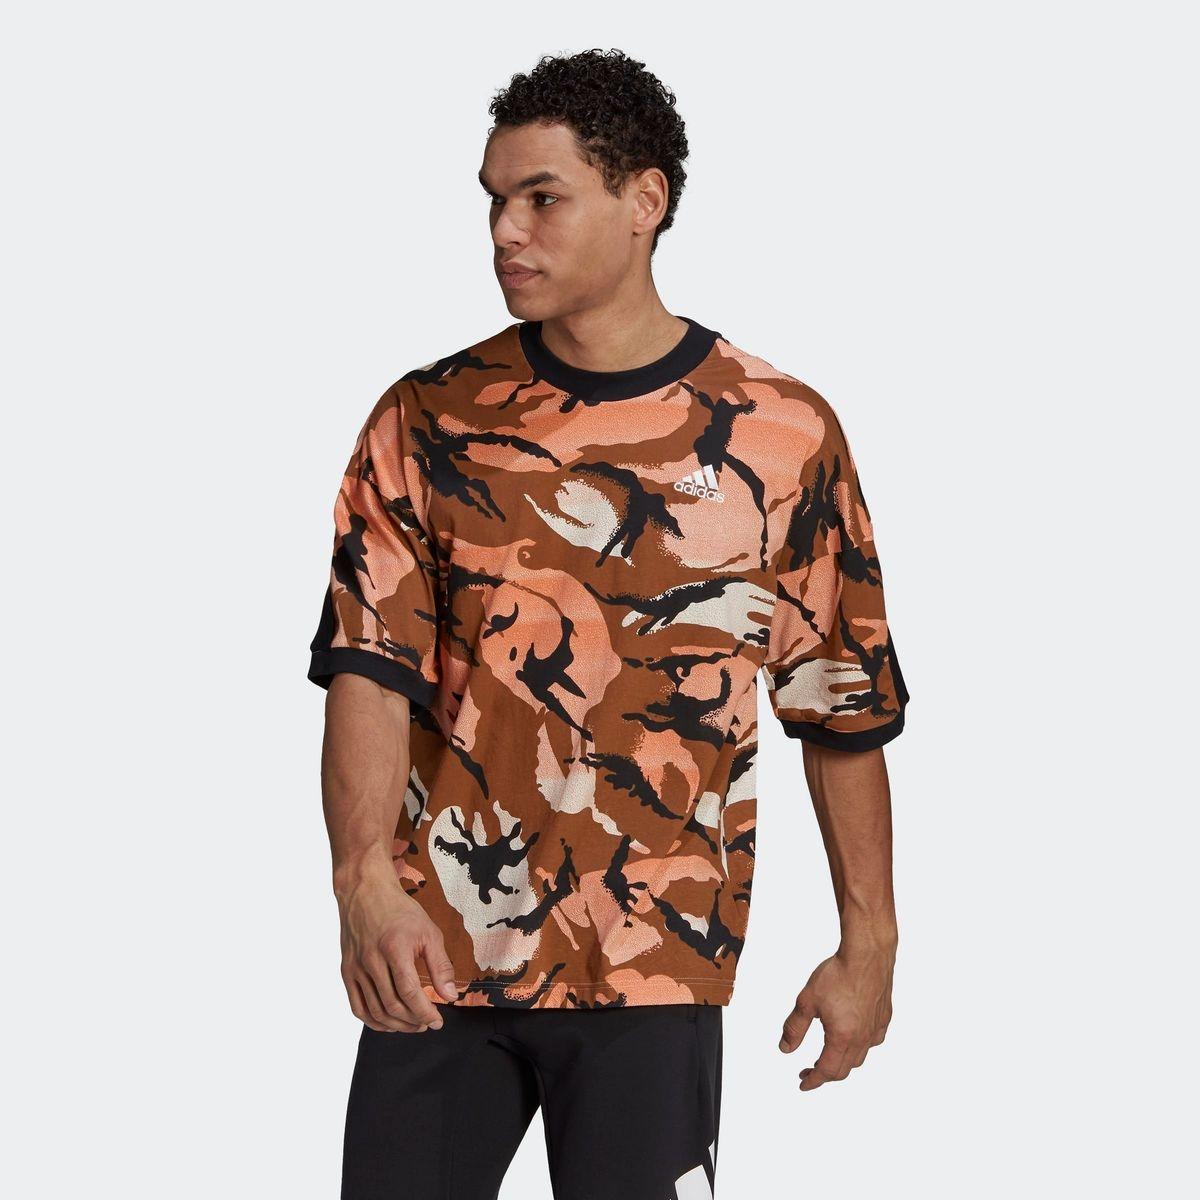 T-shirt adidas Sportswear Desert Camouflage Allover Print